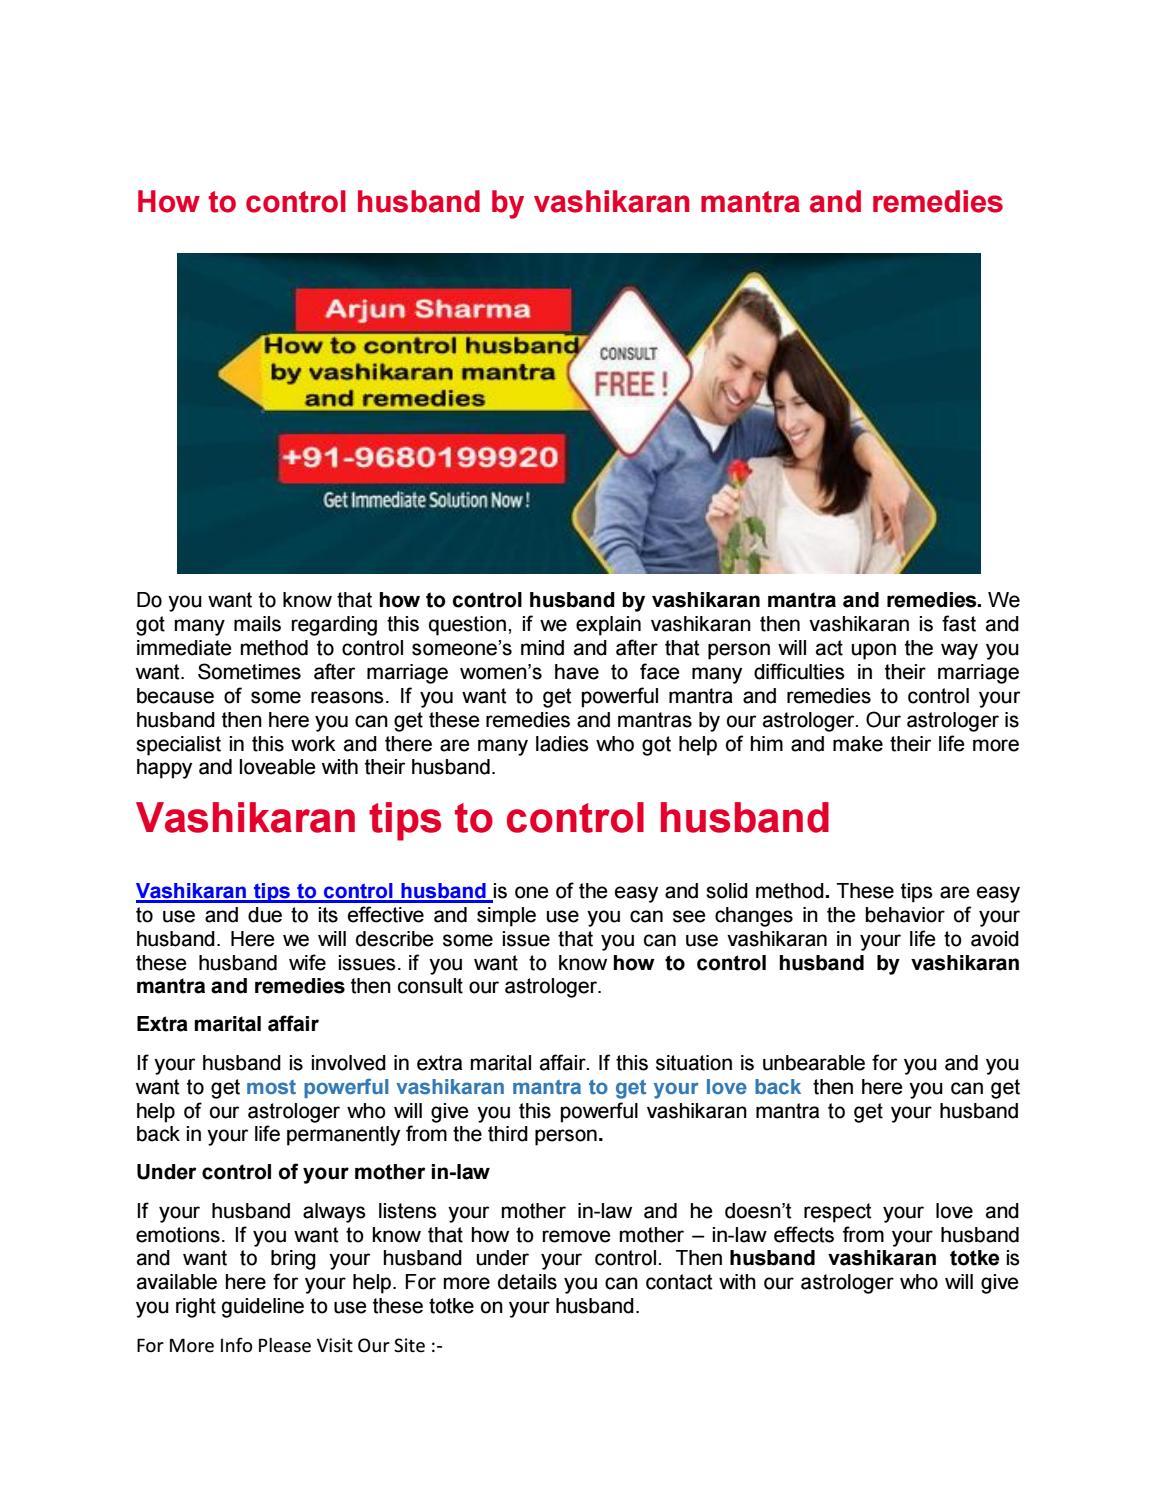 Vashikaran tips to control husband   +91-9680199920 by Arjun